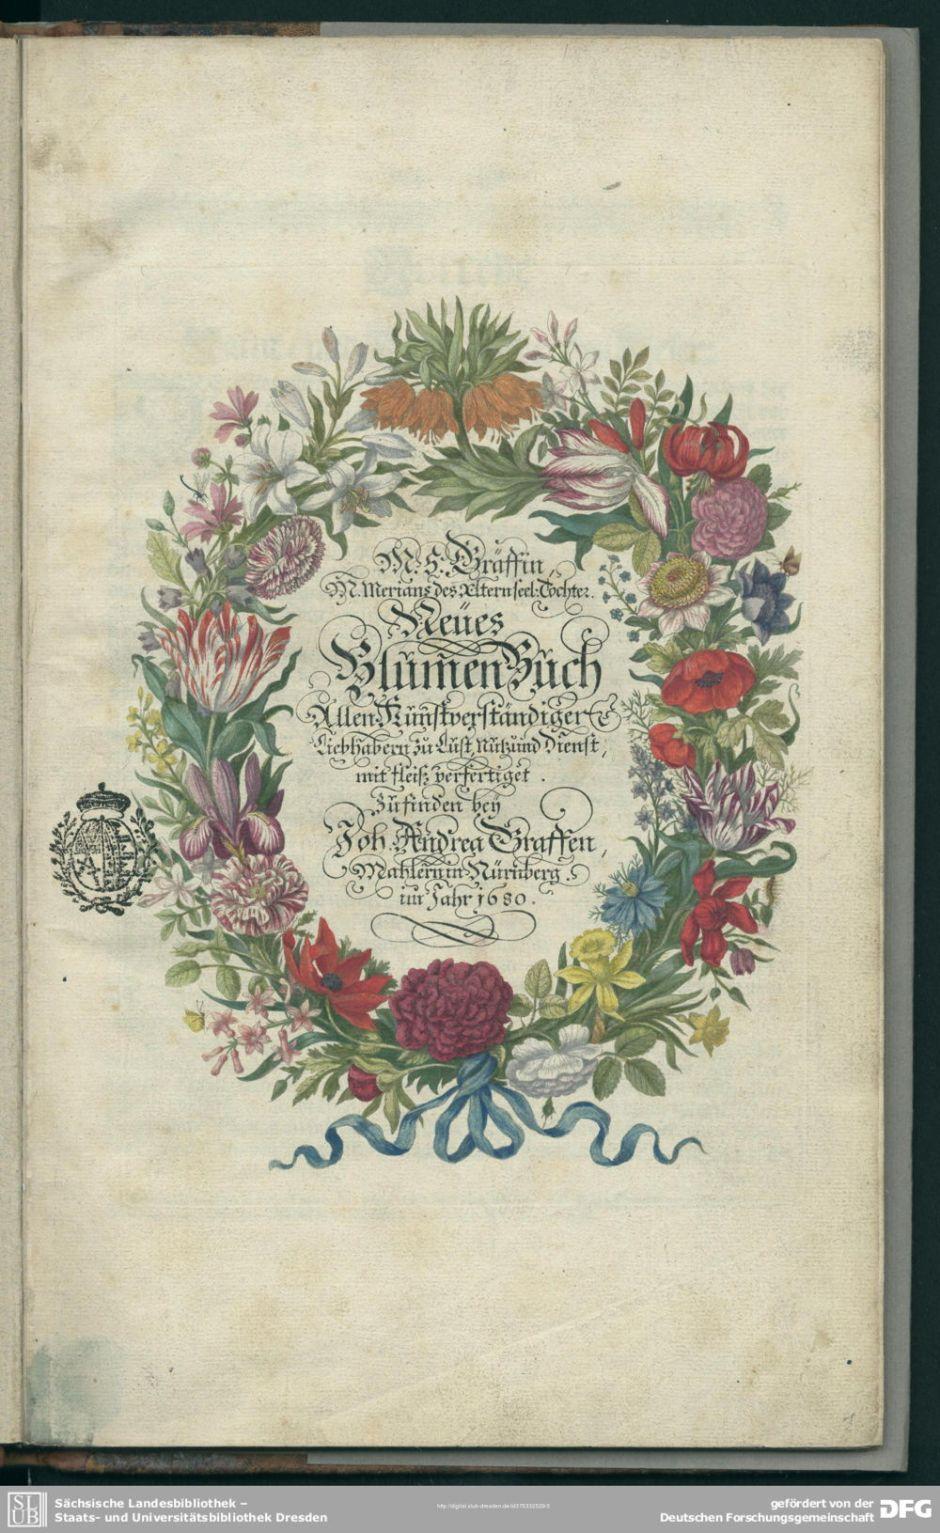 merianflowerbooktitle